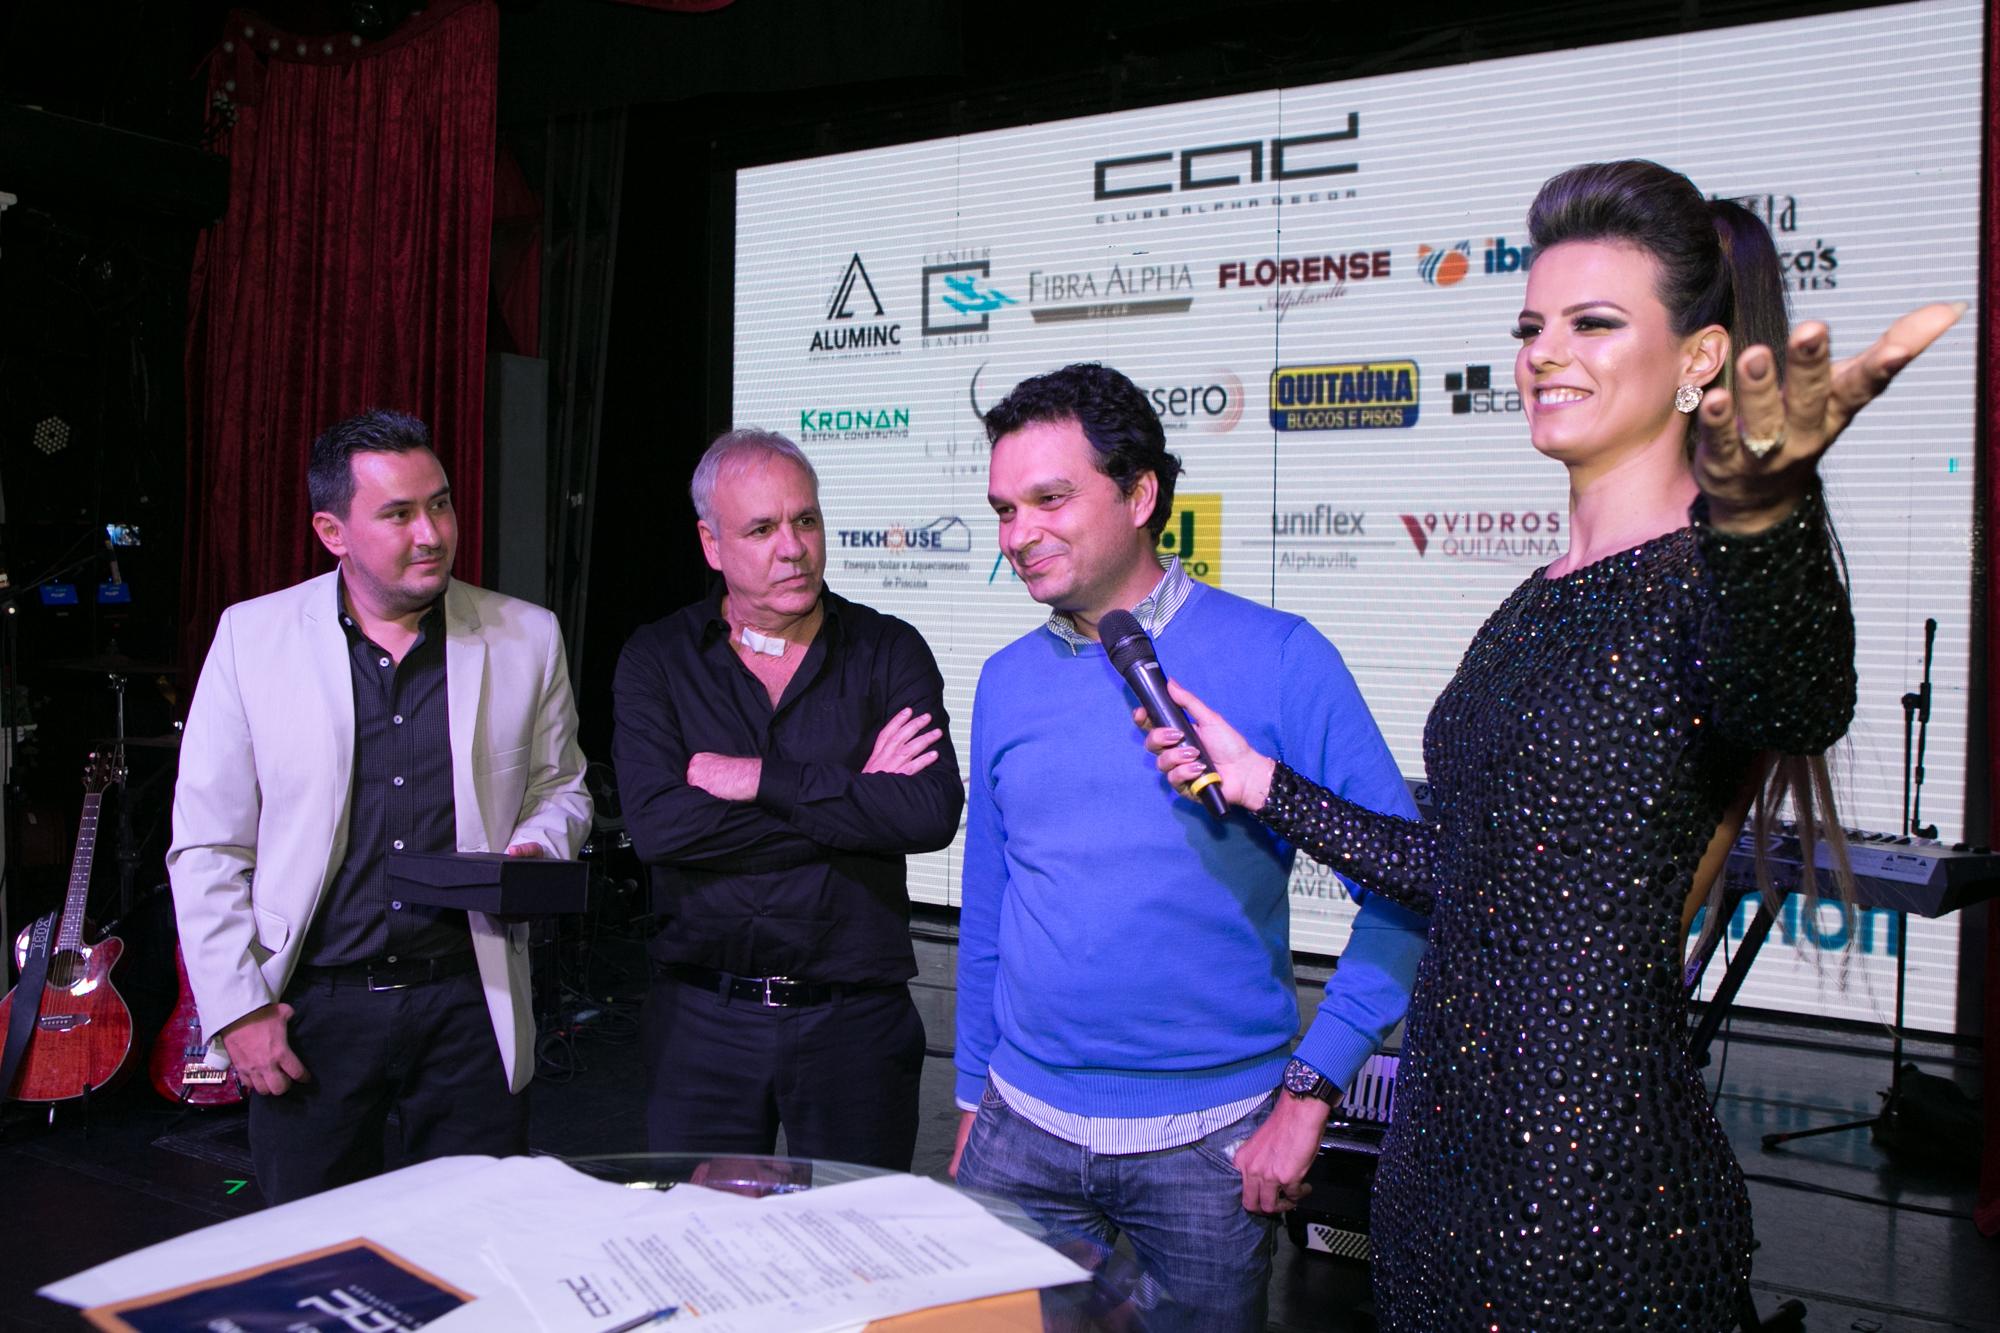 CAD - FESTA DE ENCERRAMENTO DE CICLO (12